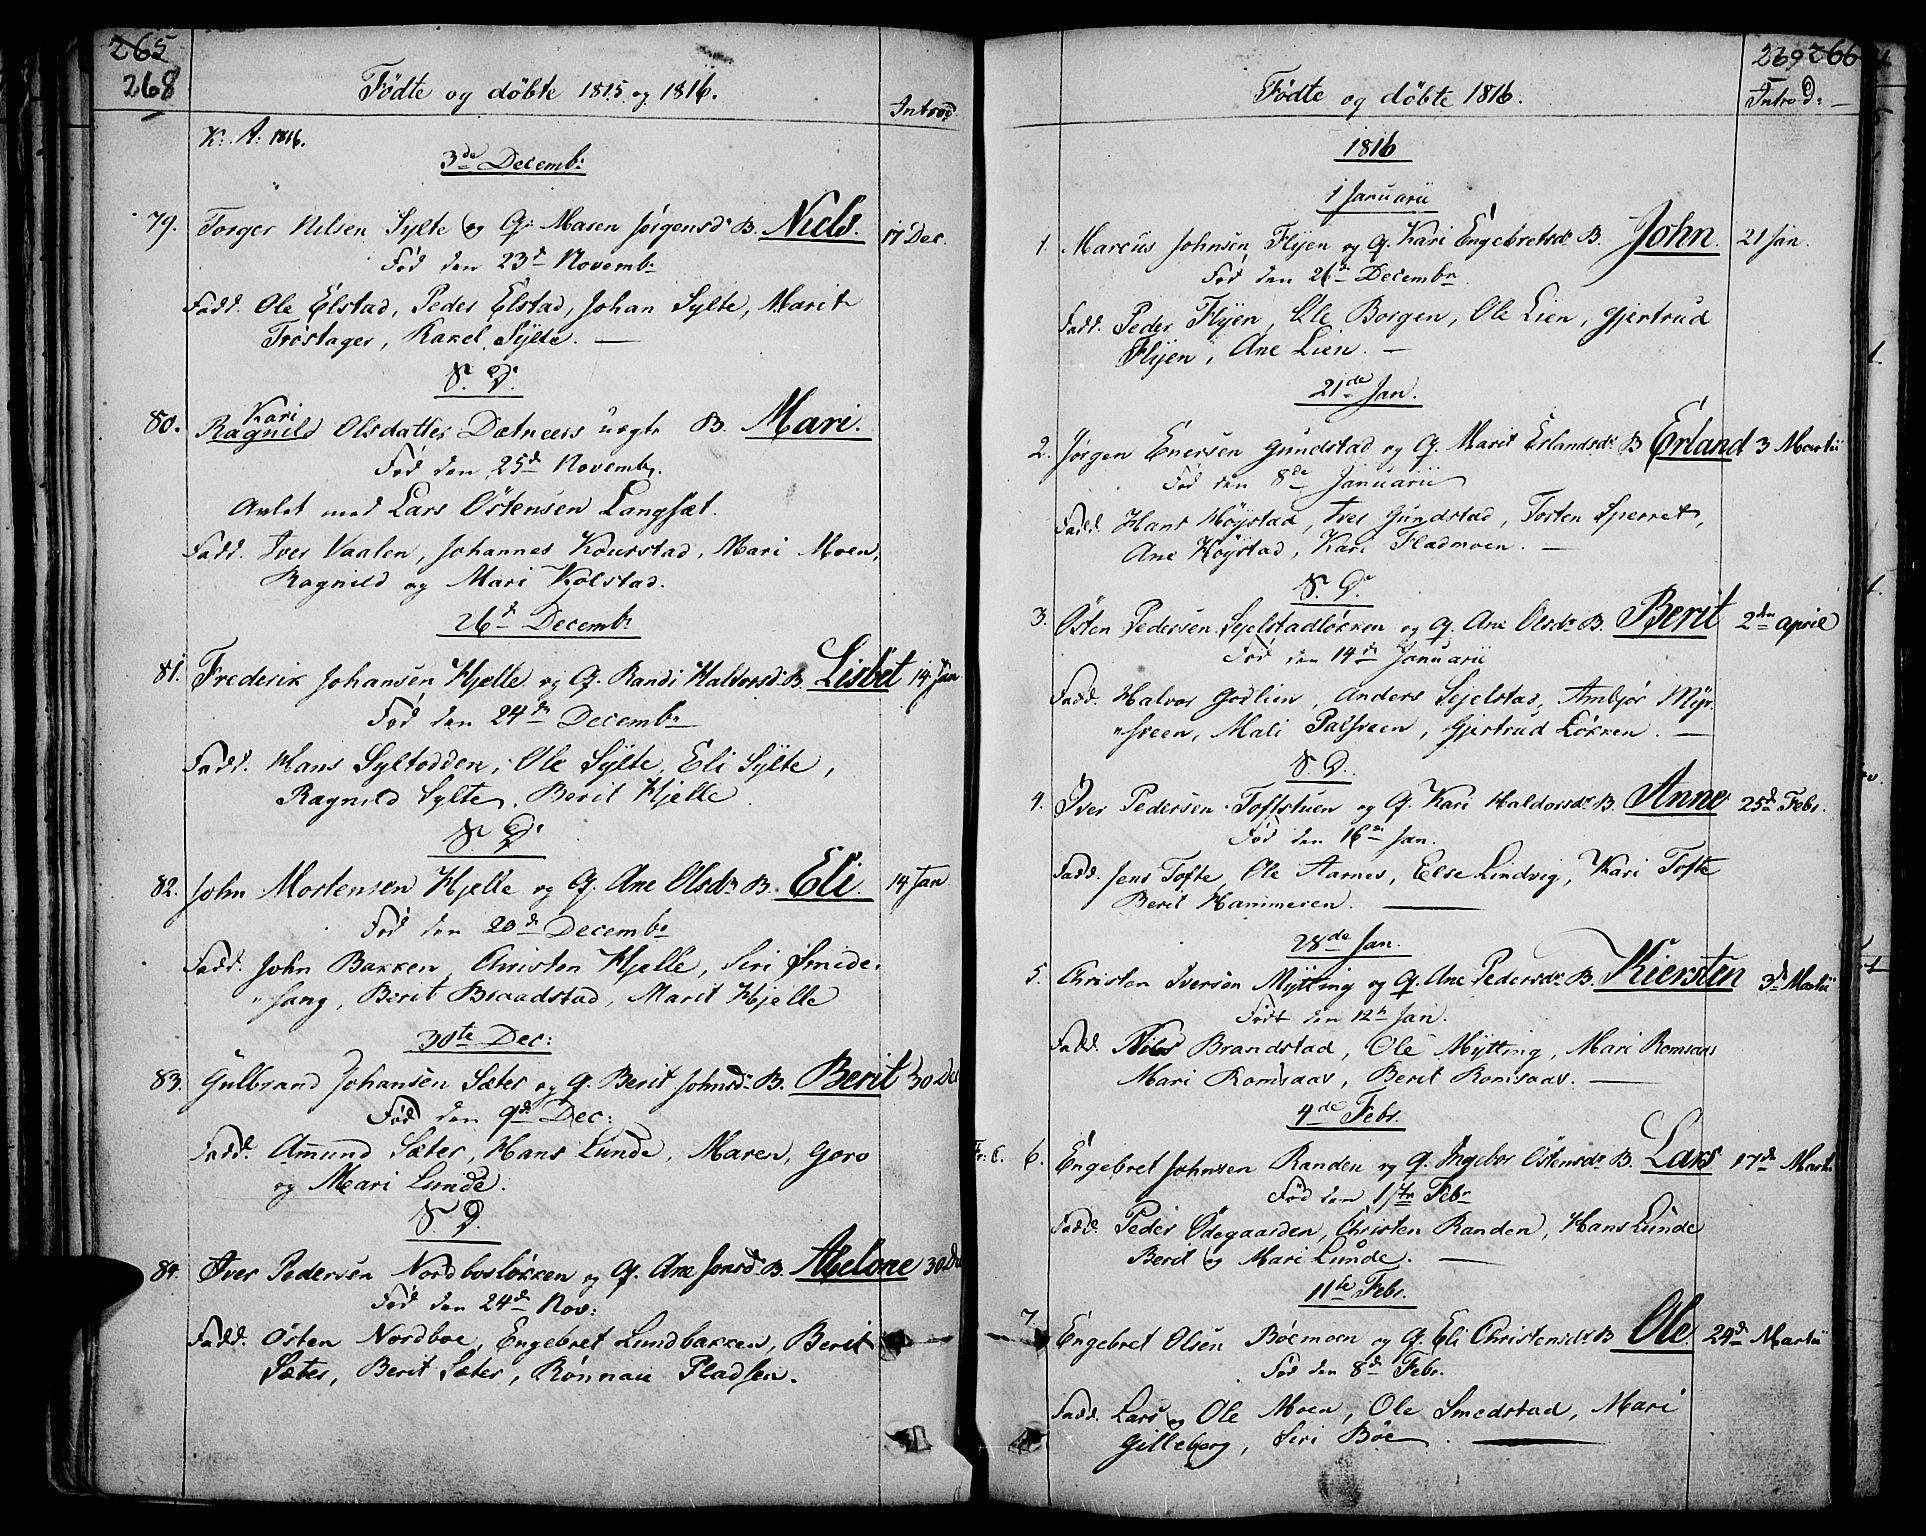 SAH, Ringebu prestekontor, Ministerialbok nr. 3, 1781-1820, s. 268-269